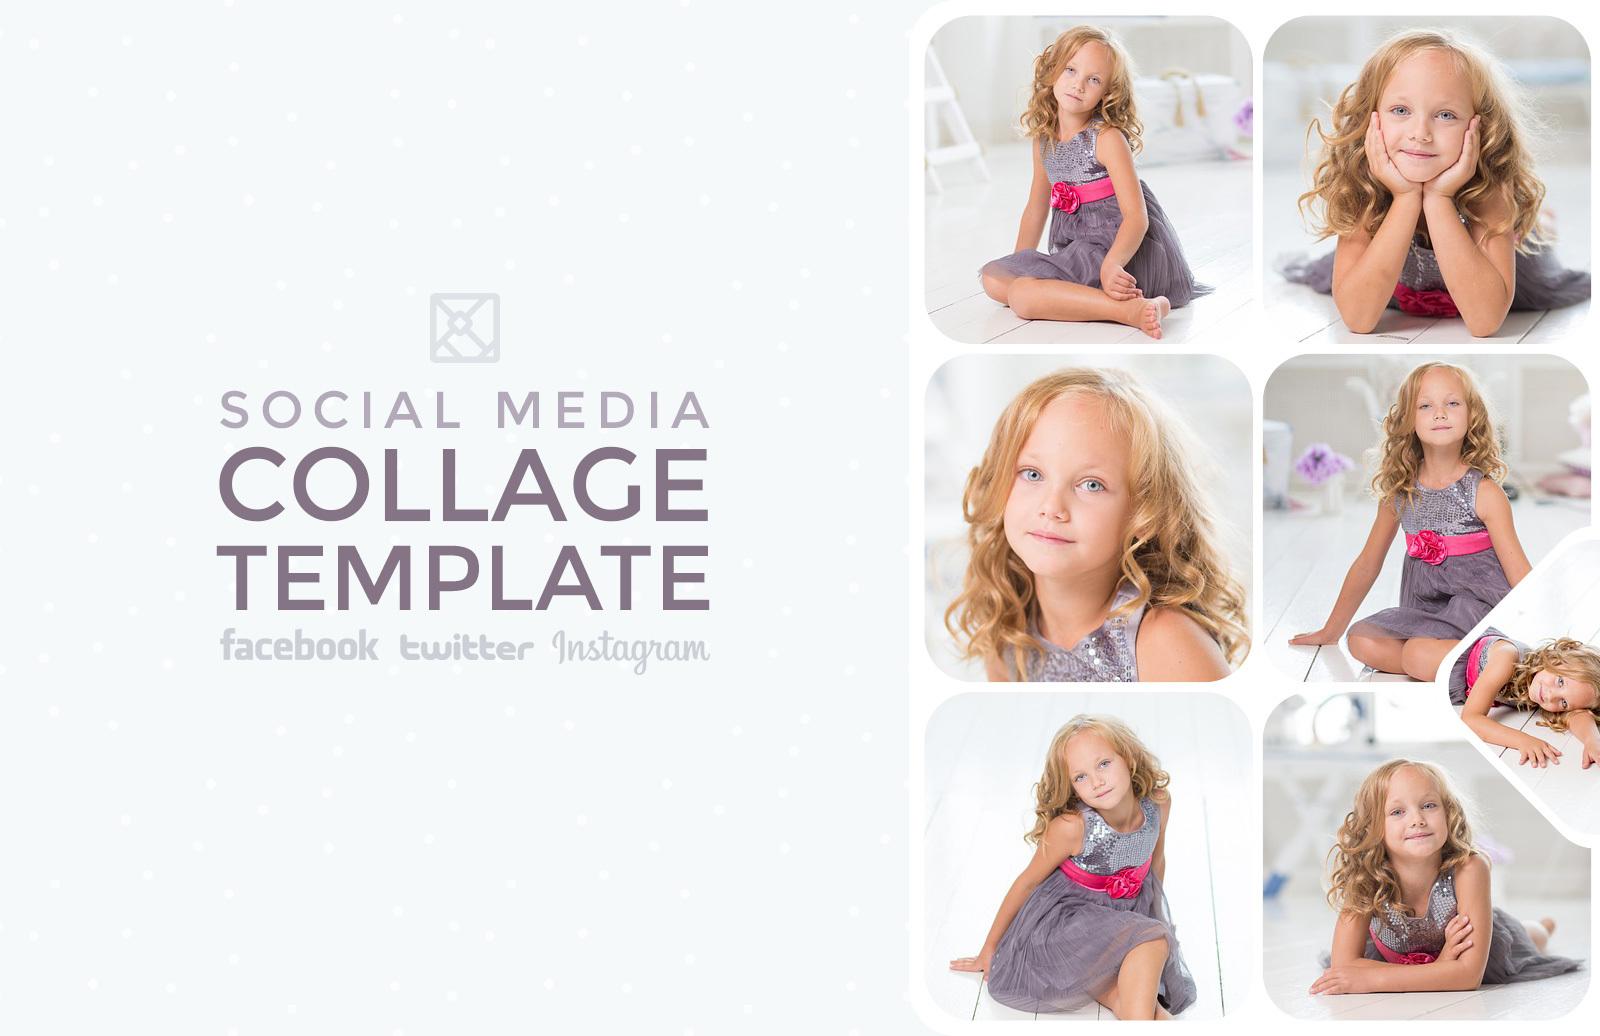 Social Media Photo Collage Templates